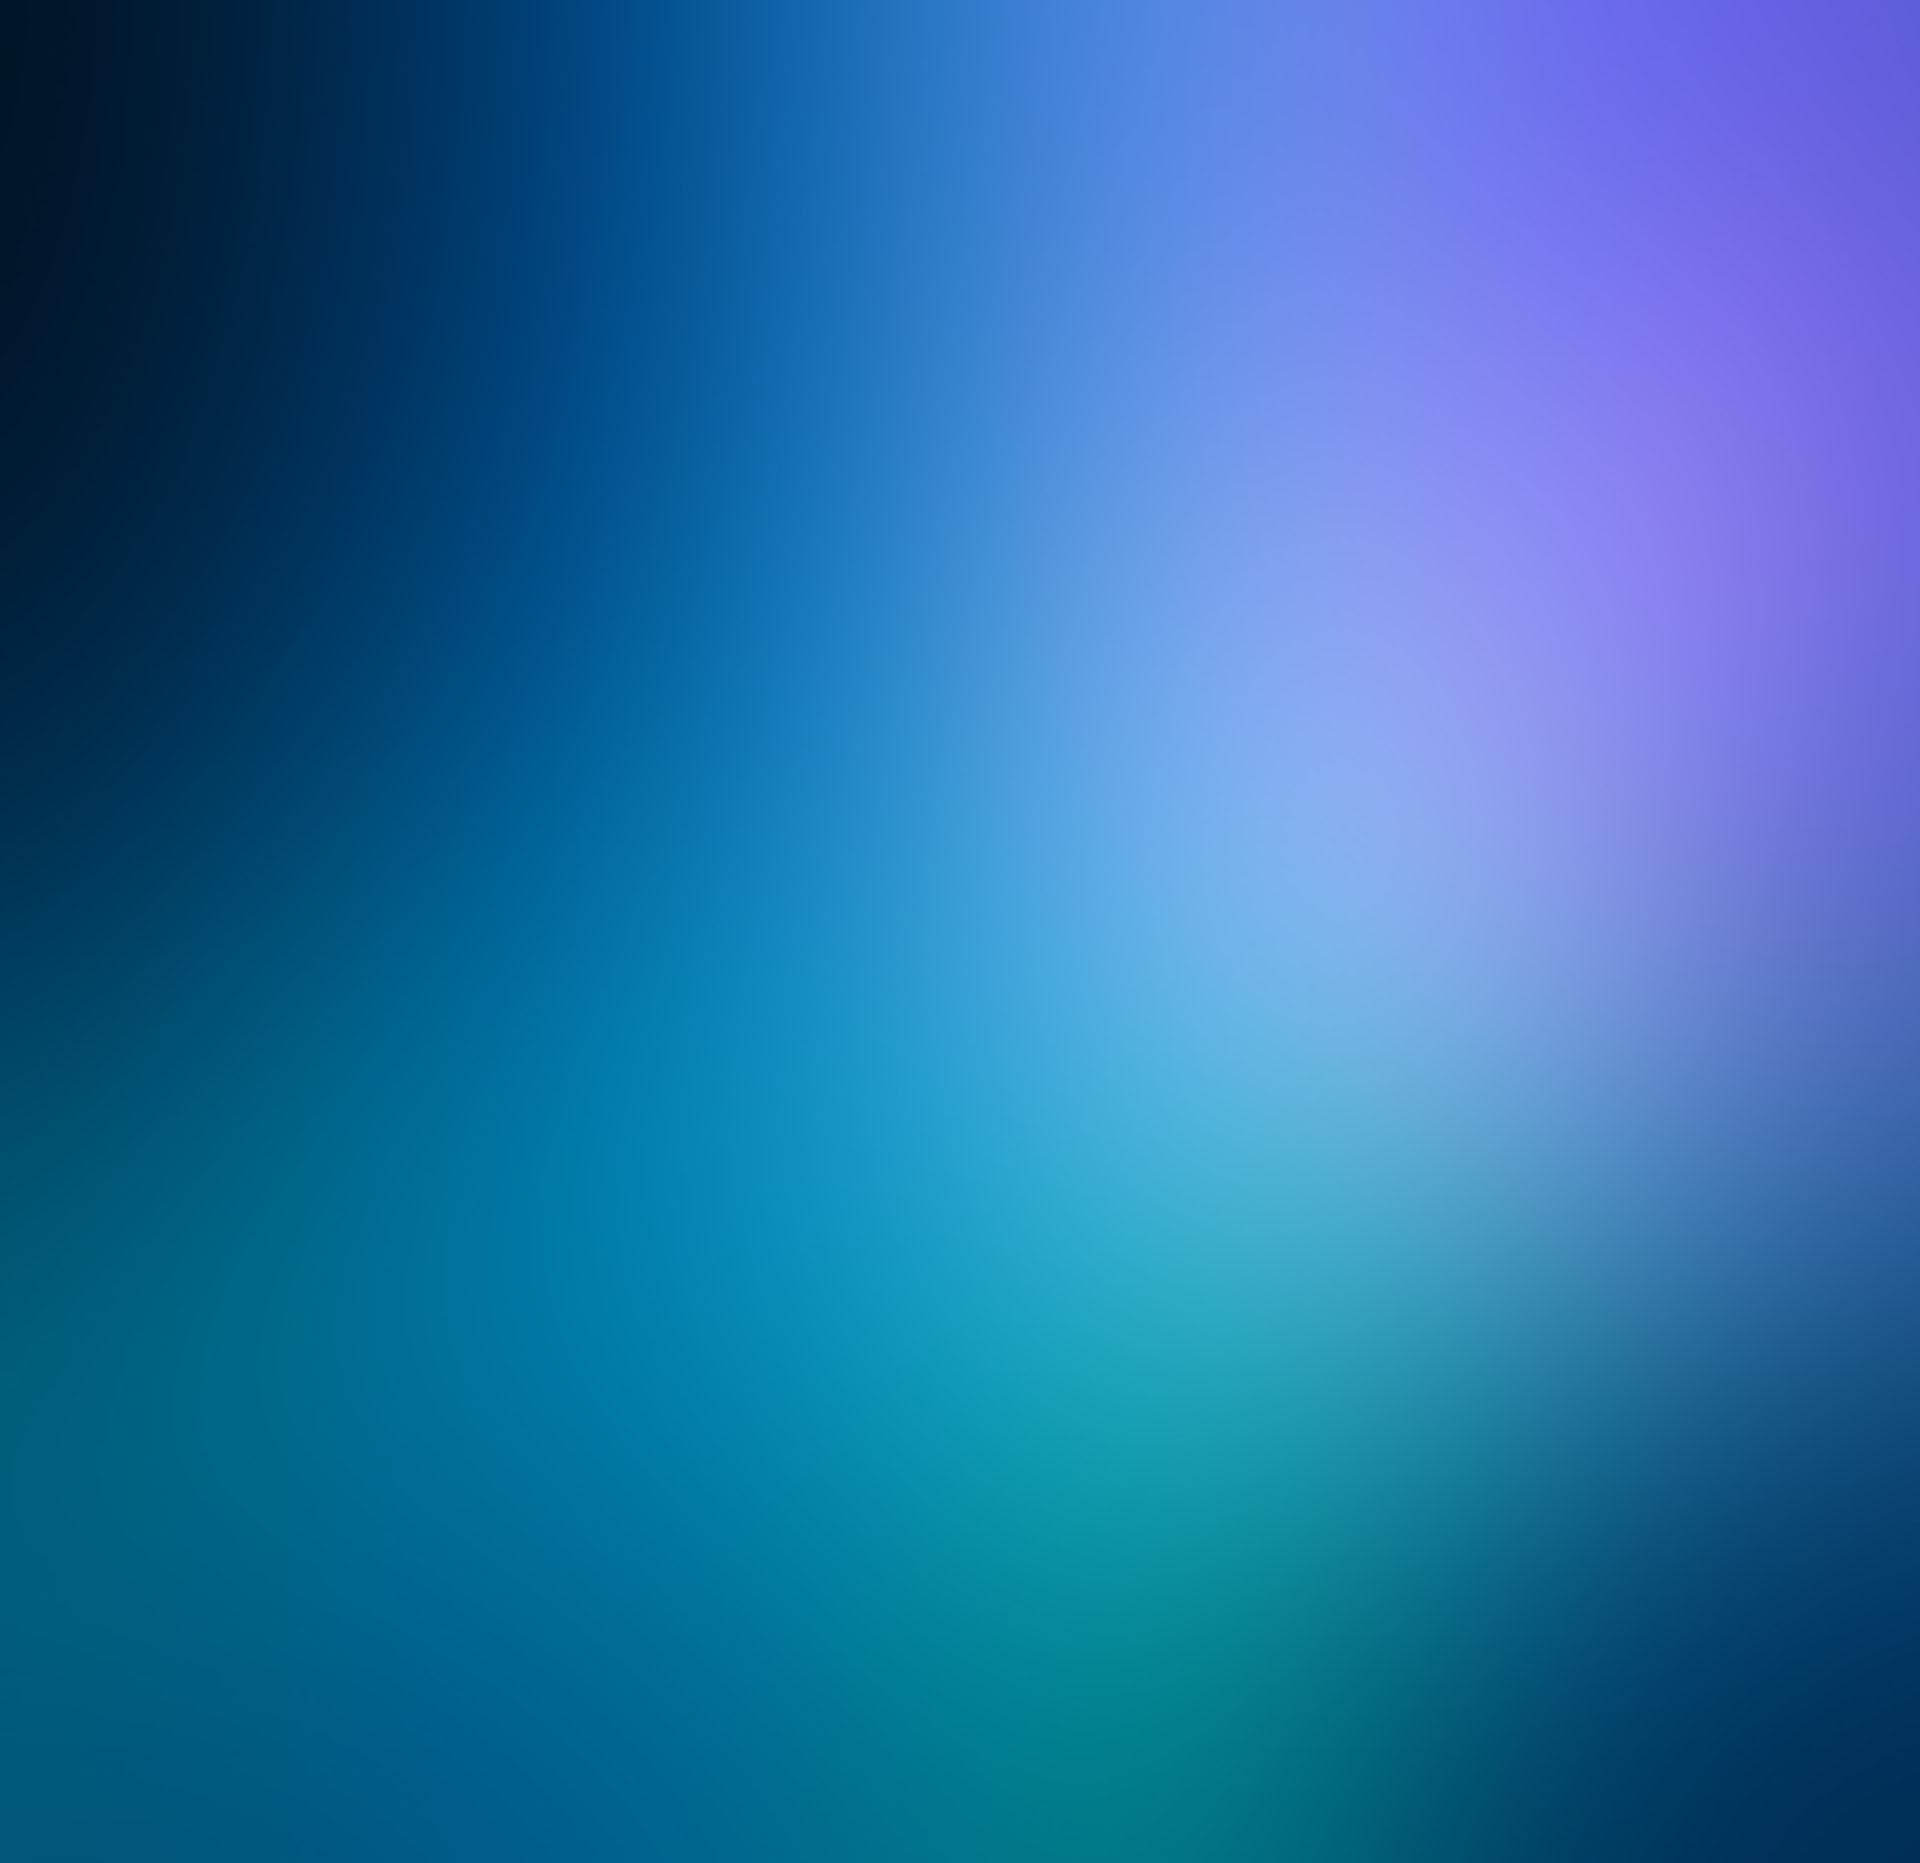 react-blur-admin CDN by jsDelivr - A free, fast, and